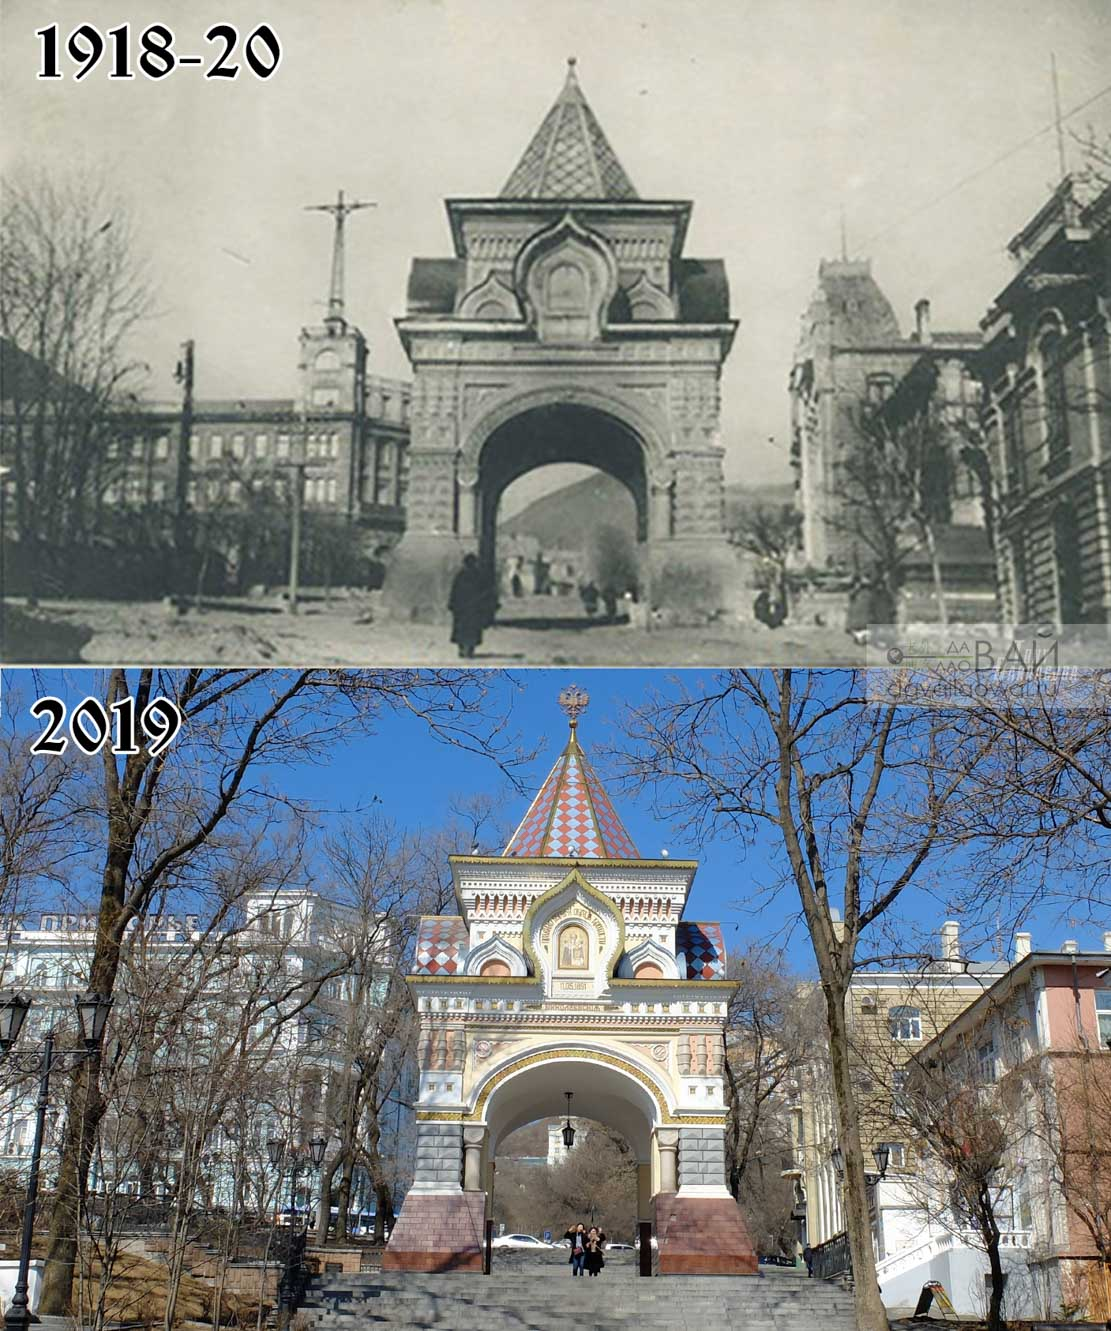 Арка цесаревича Николая. Уничтожена коммунистами. Восстановлена в 2003 г